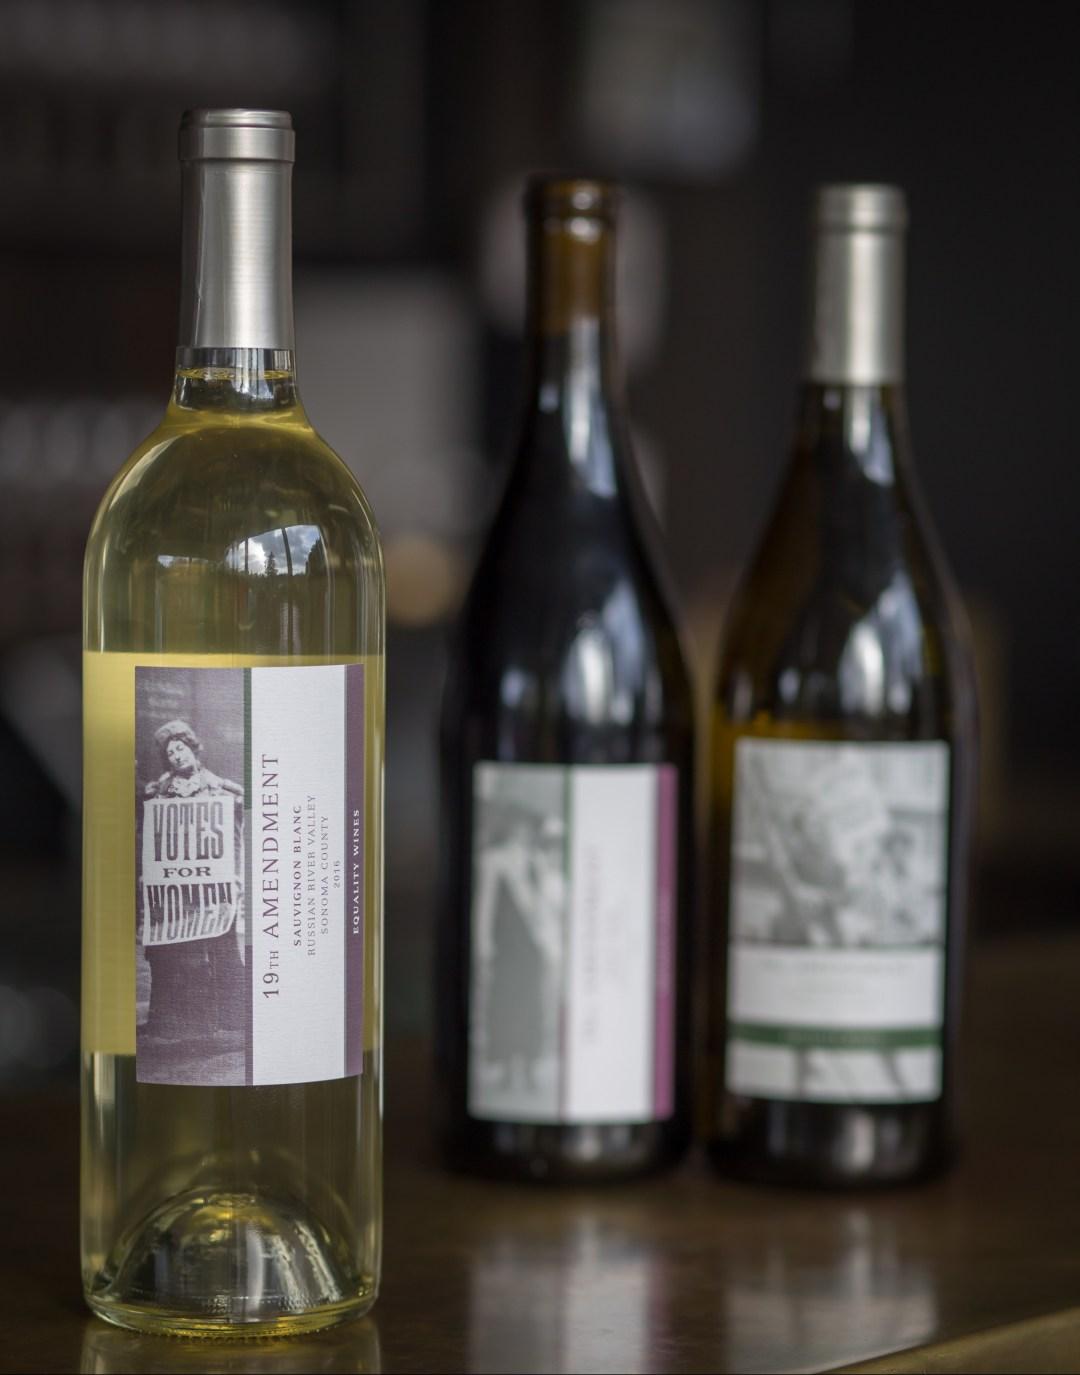 19th Amendment Sauvignon Blanc from Equality Vines